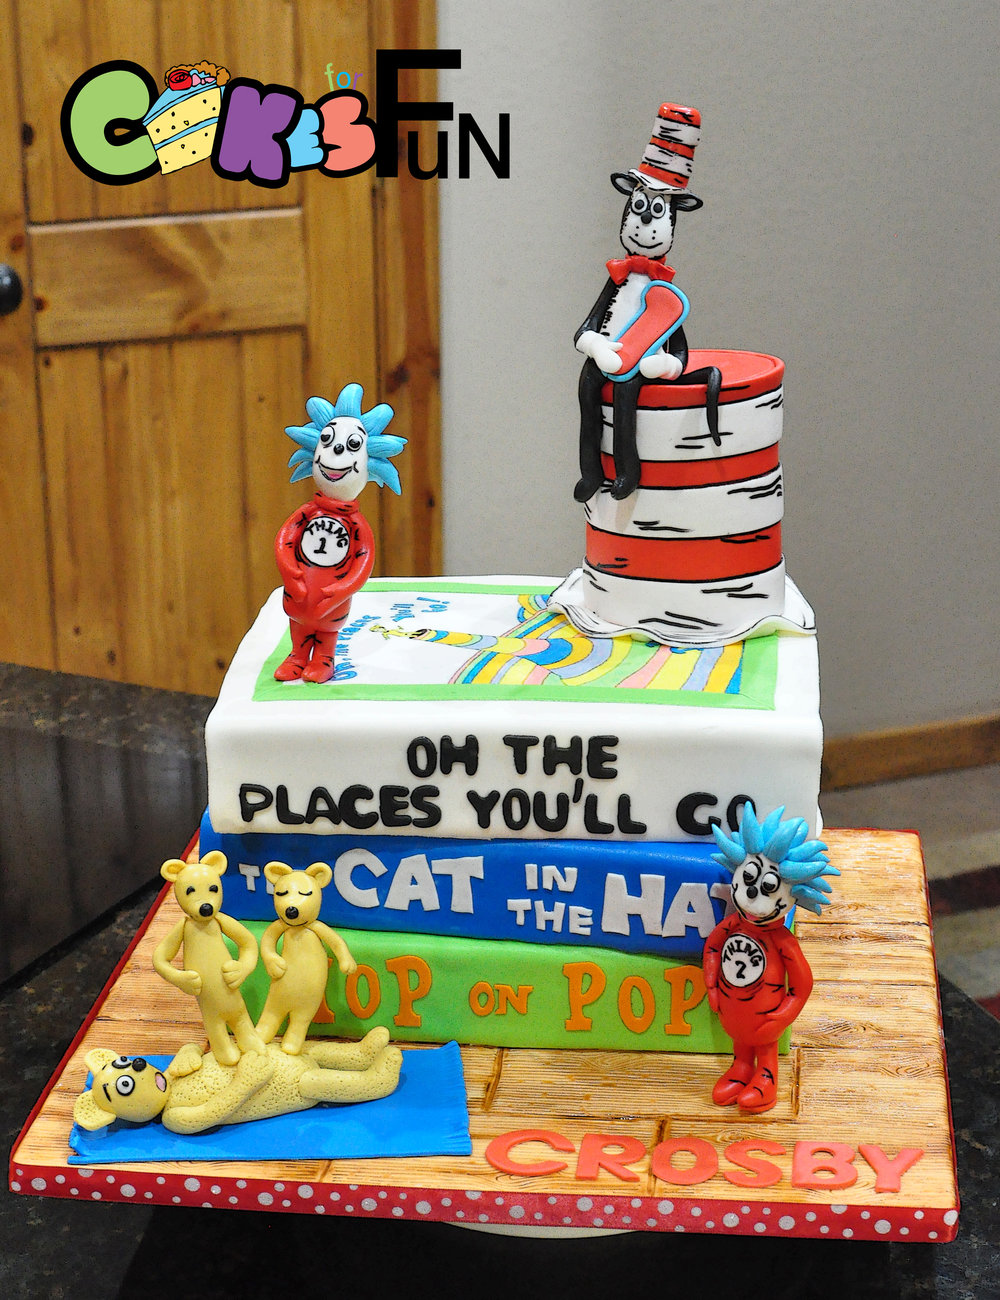 Dr. Seuss Book Cake.jpg